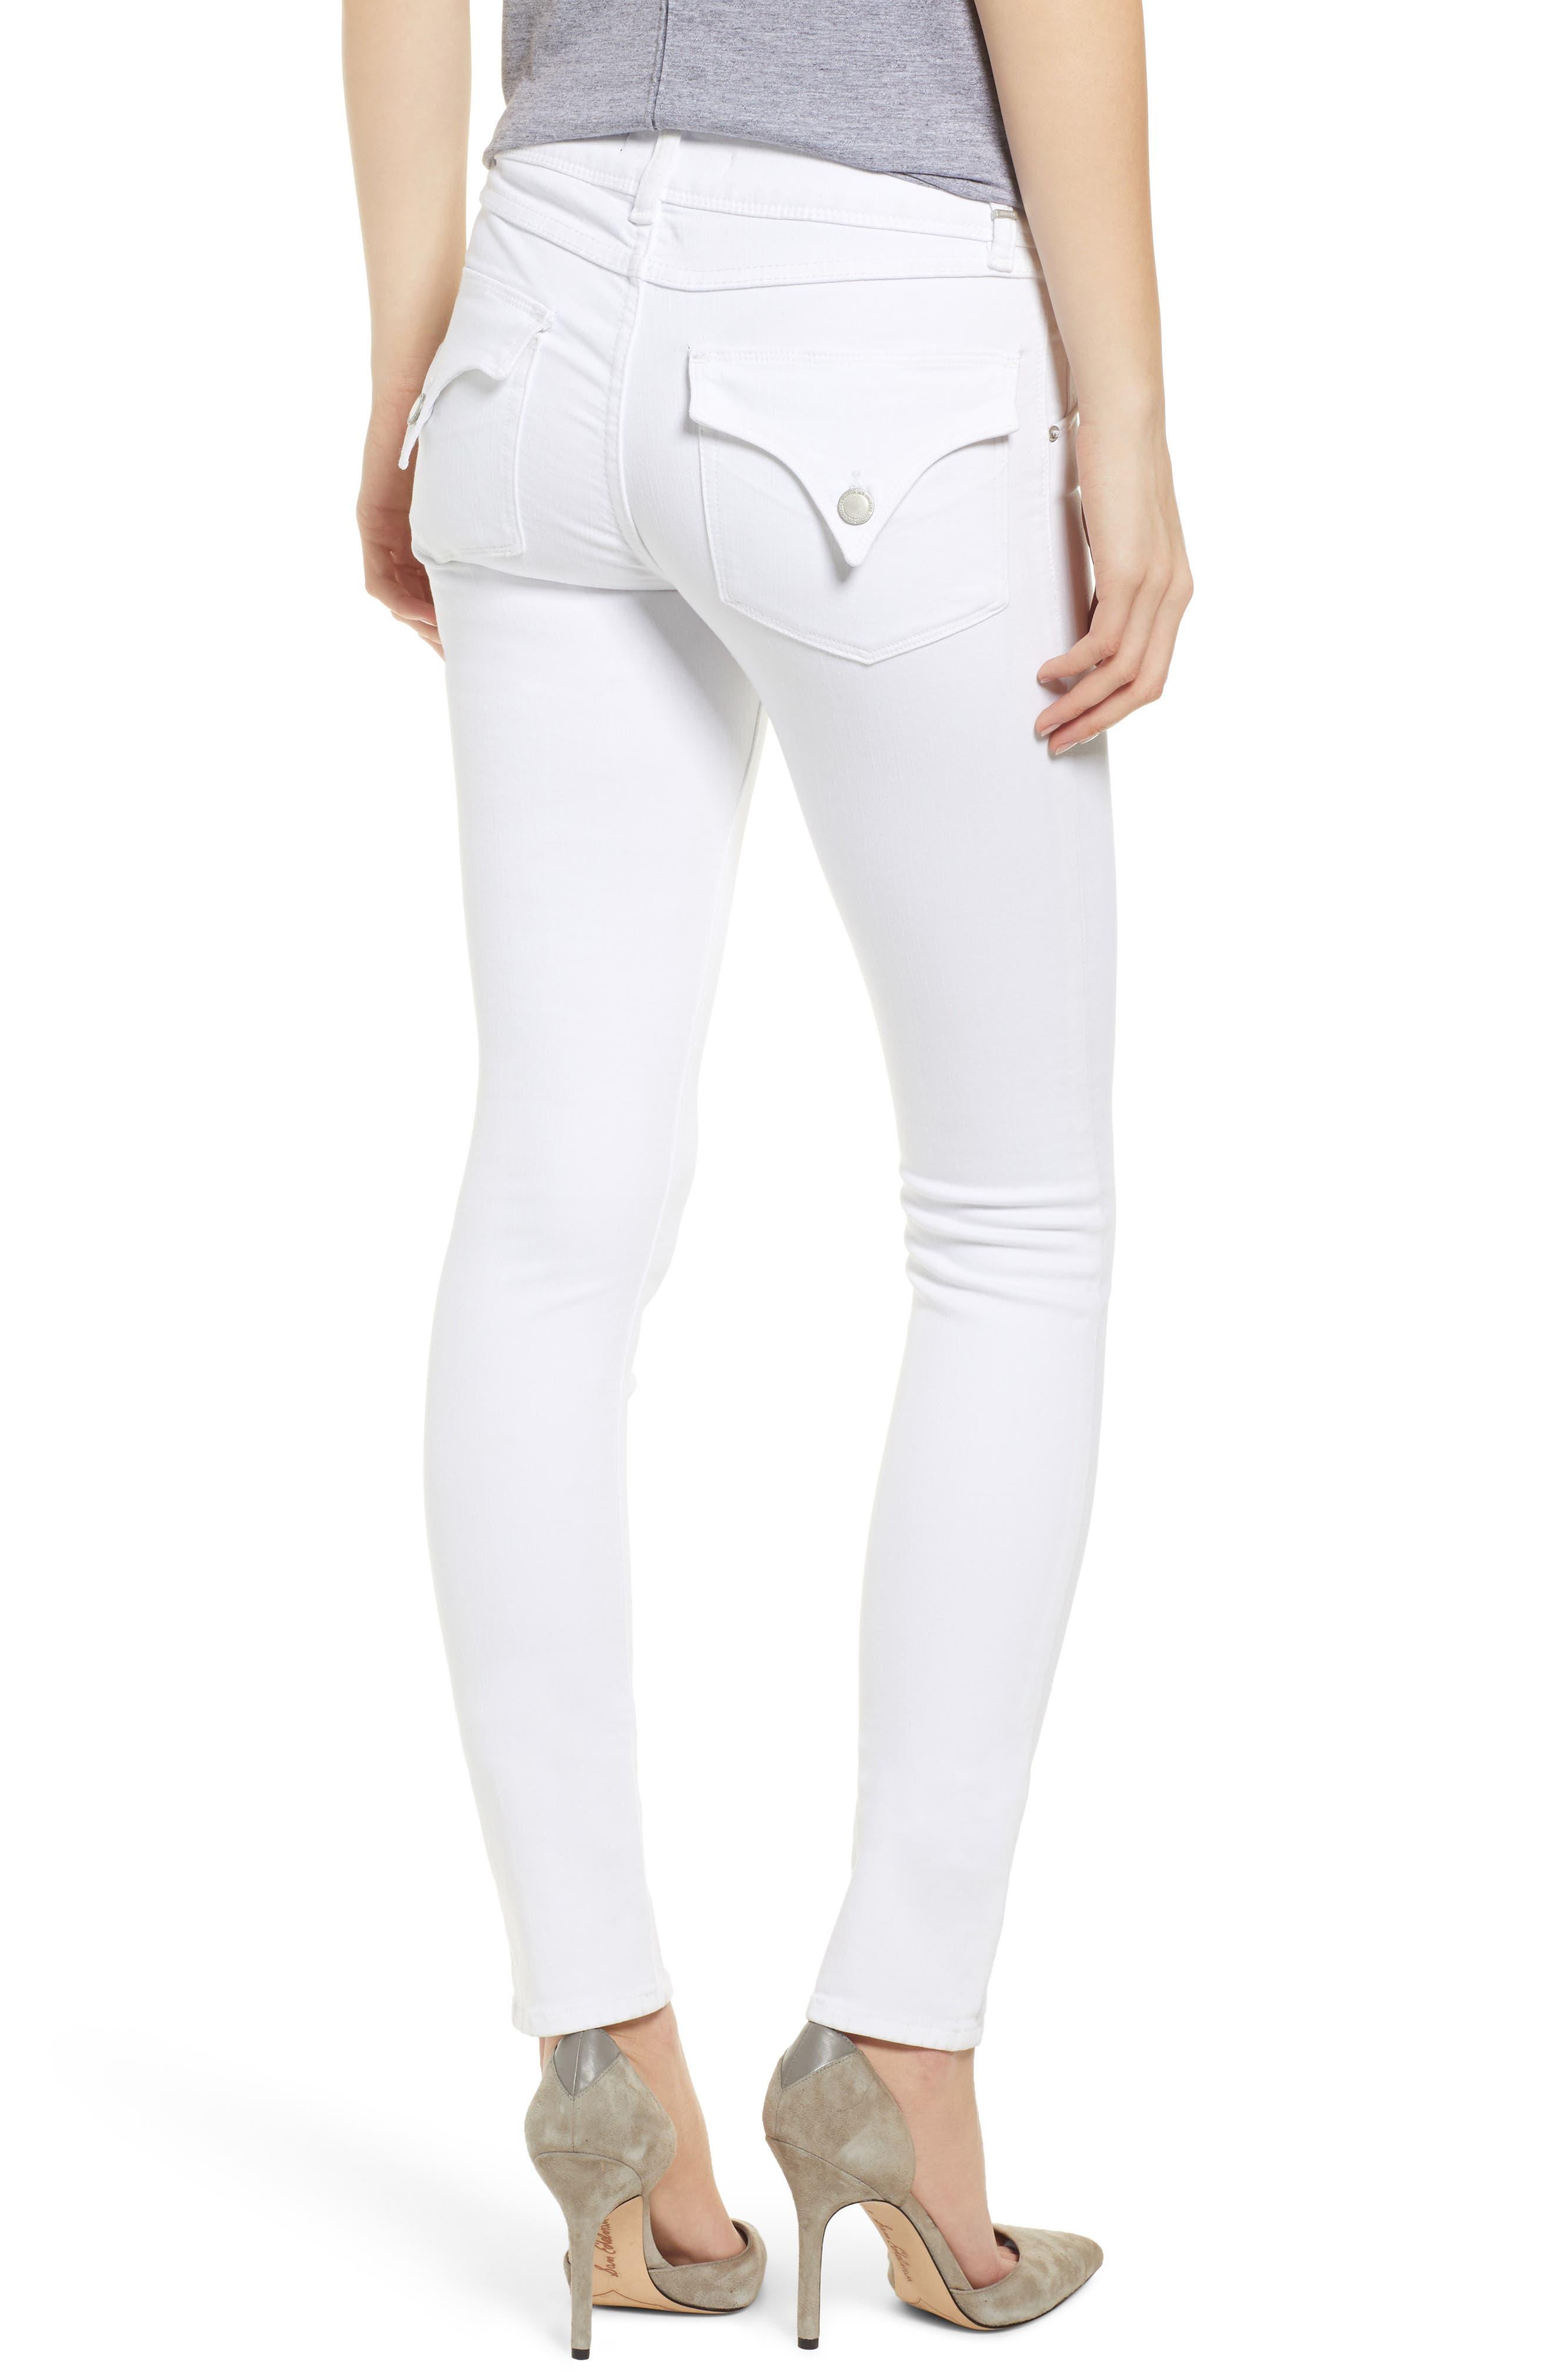 HUDSON JEANS,                             Collin Skinny Jeans,                             Alternate thumbnail 2, color,                             WHITE